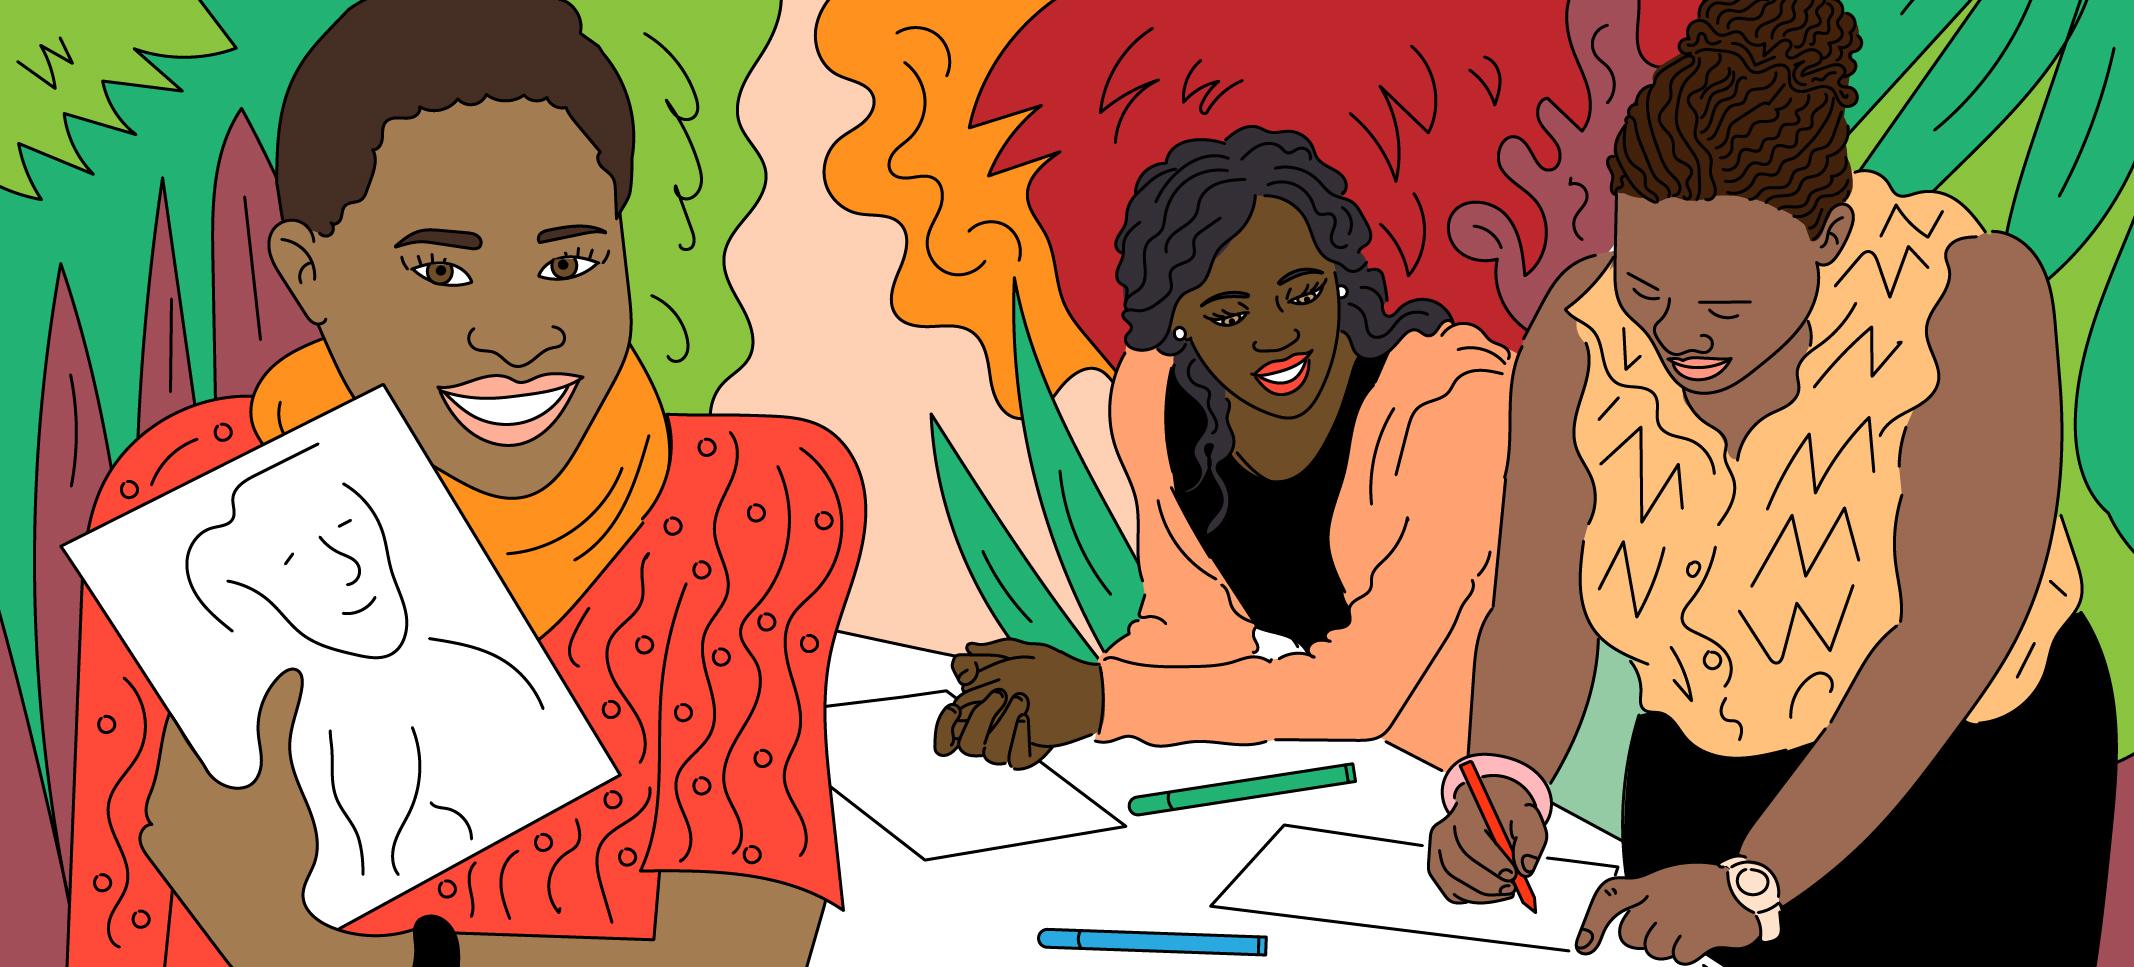 Kenya_illustration-01.jpg